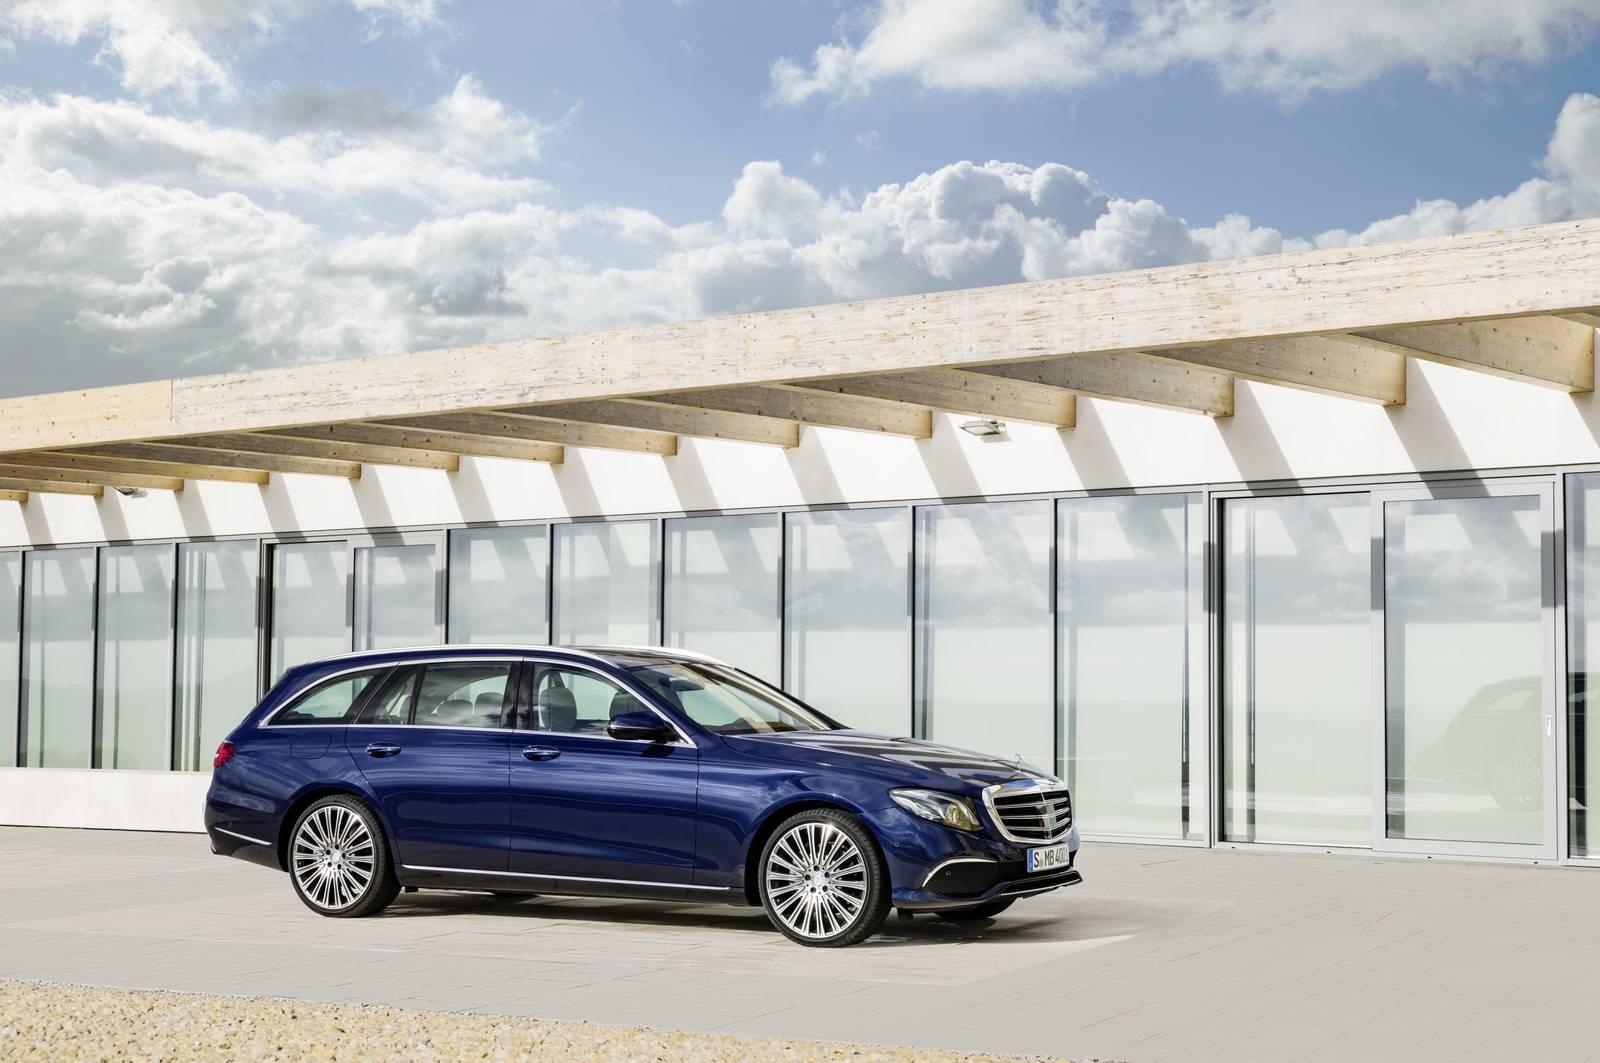 http://gtspirit.com/wp-content/uploads/2016/06/Mercedes-Benz-E43-Estate-7.jpg